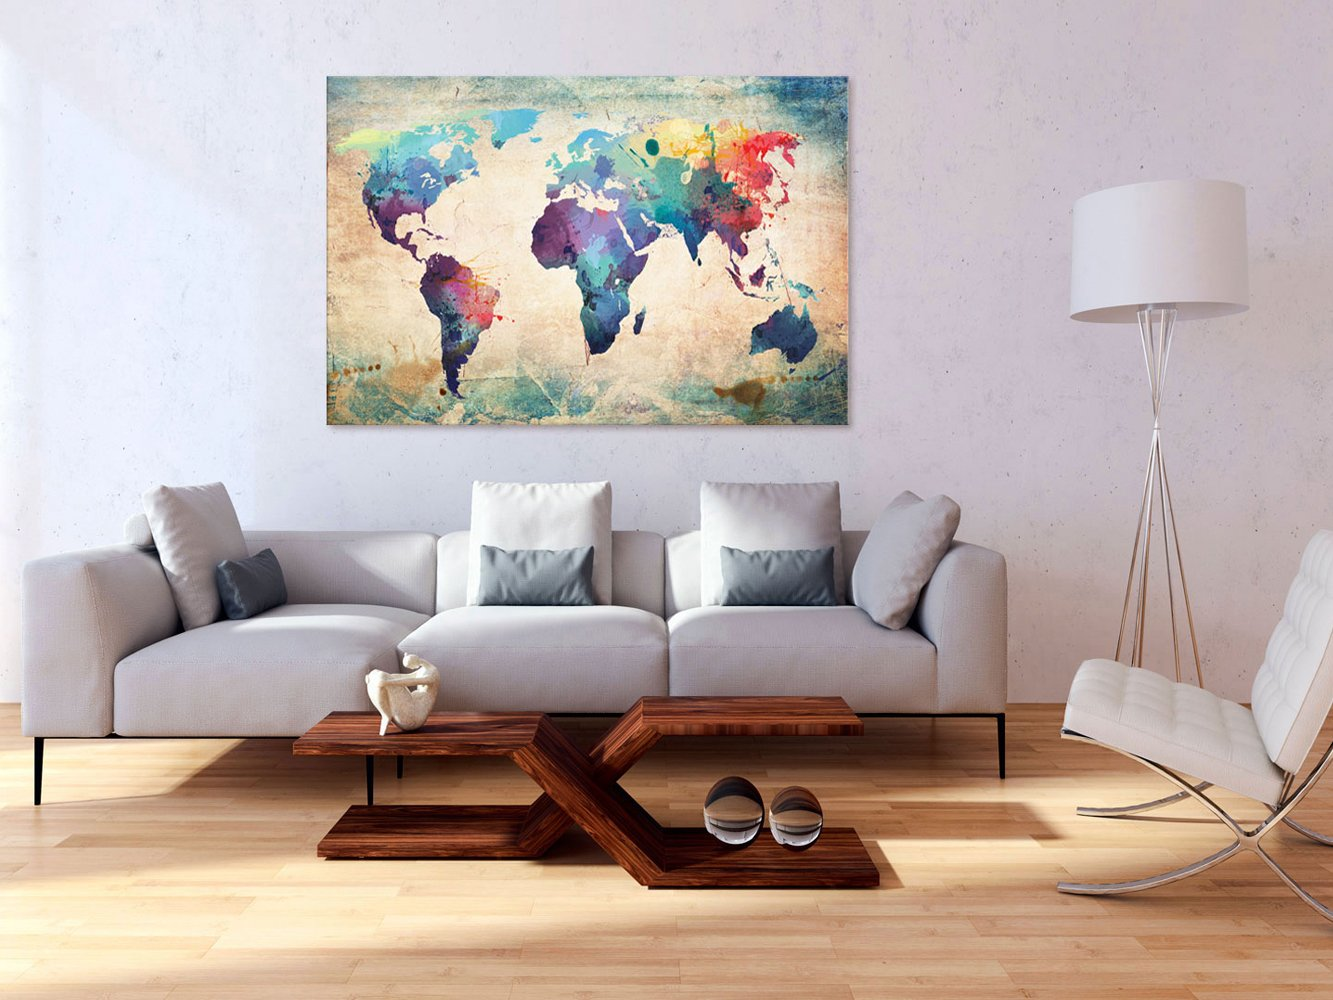 Kunstdruck modern Wandbilder XXL Wanddekoration Design Wand Bild Kontinent Landkarte Karte Reise k-B-0048-v-e Weltkarte Pinnwand /& Vlies Leinwandbild 135x90 cm murando 3 Teilig